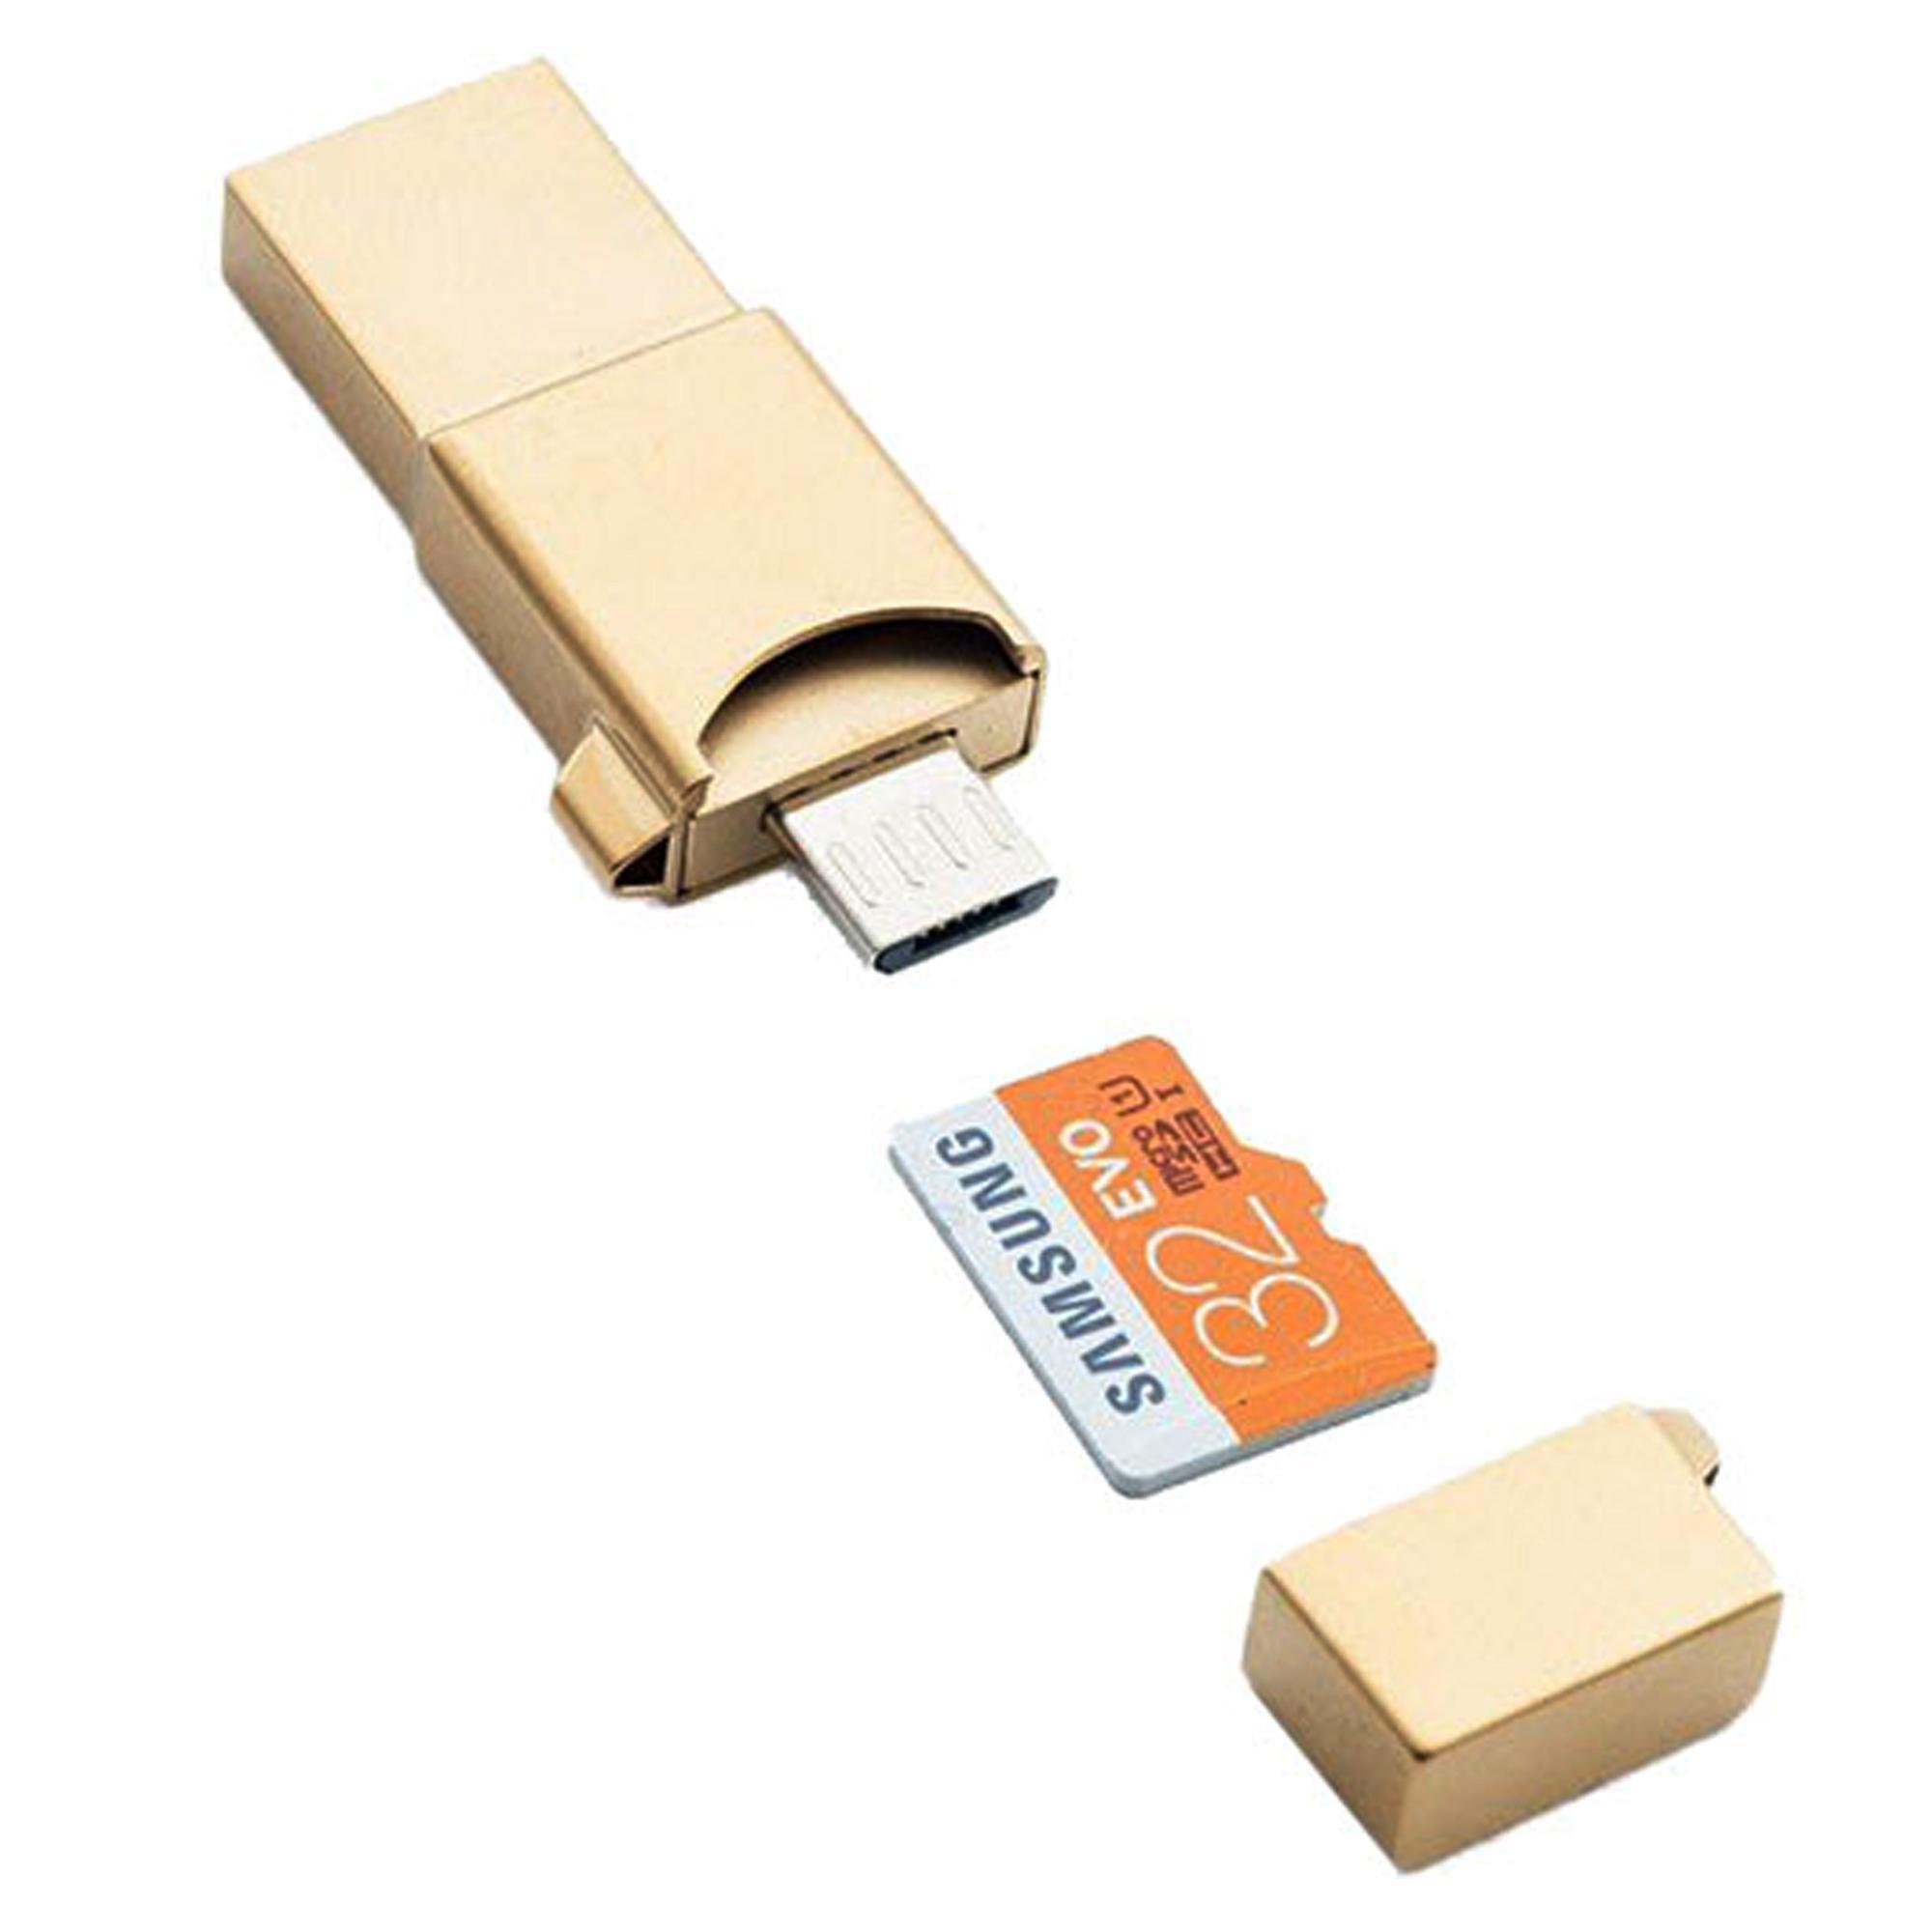 Buy Sell Cheapest Samsung 64gb Usb Best Quality Product Deals Flashdisk Dual Otg 20 30 32 Gb Evo 3 In 1 Micro Sdhc Card 32gb Cv Oem32g With Metal